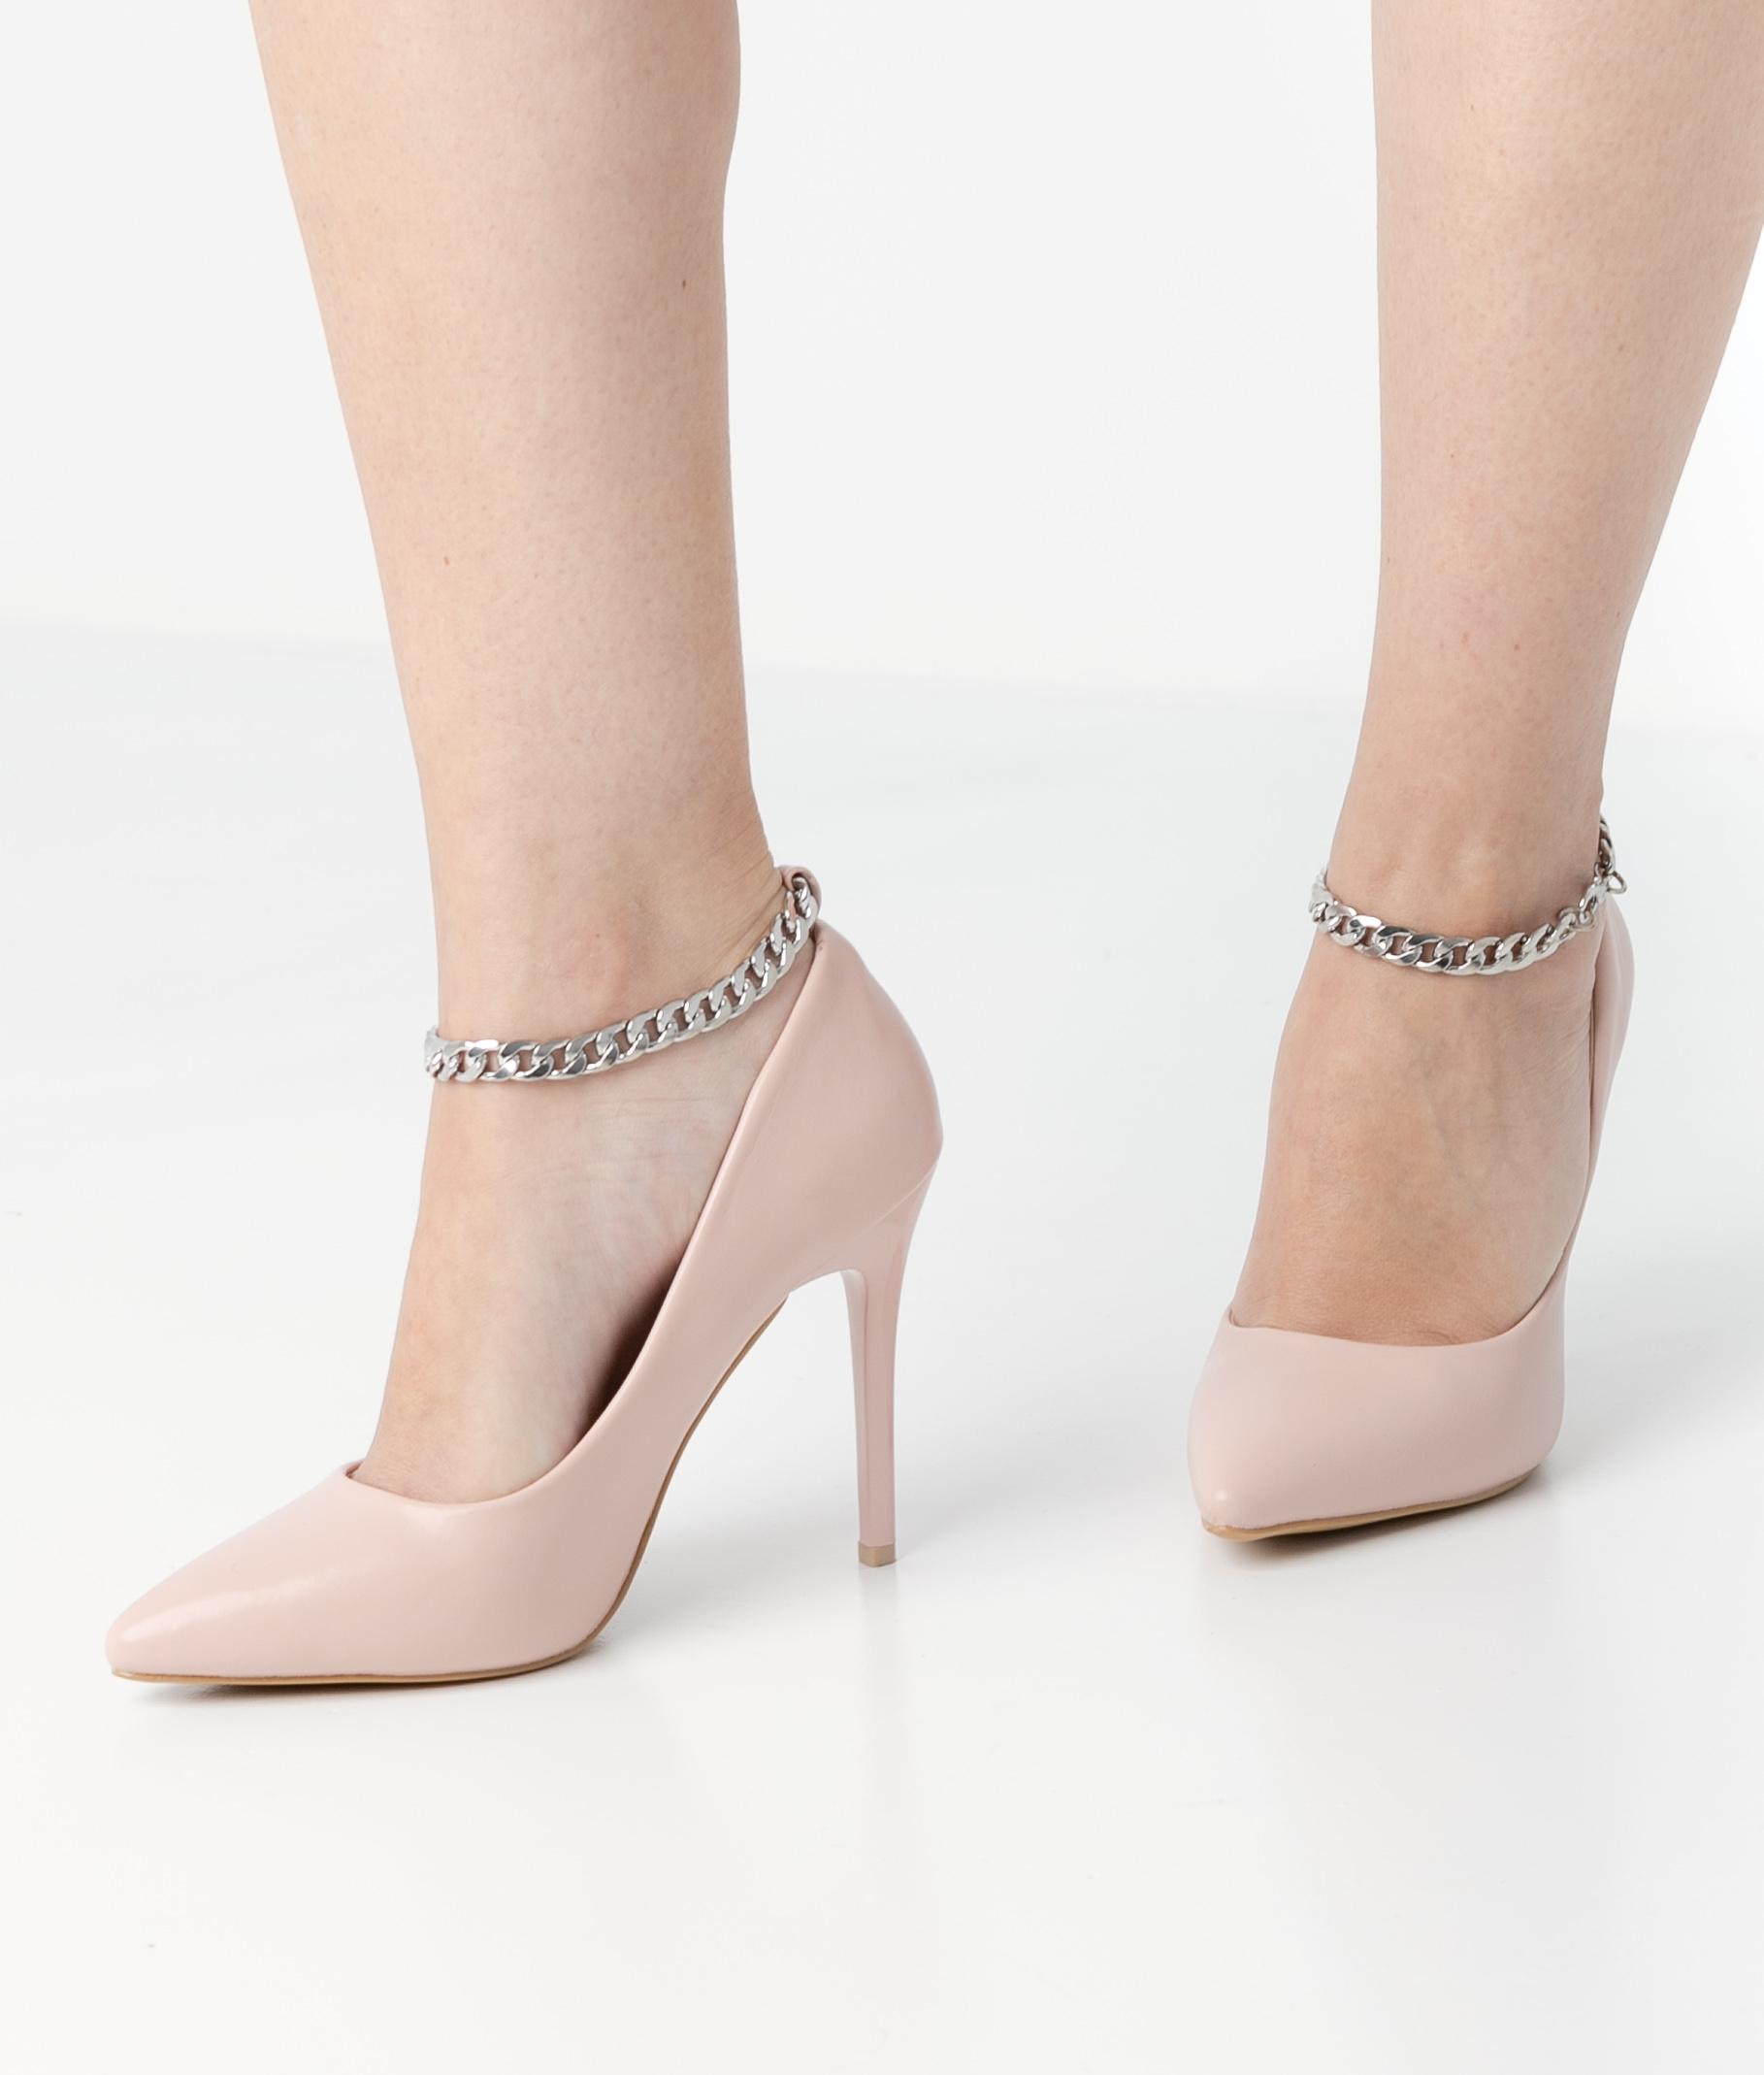 Shoe Denas - BEIGE